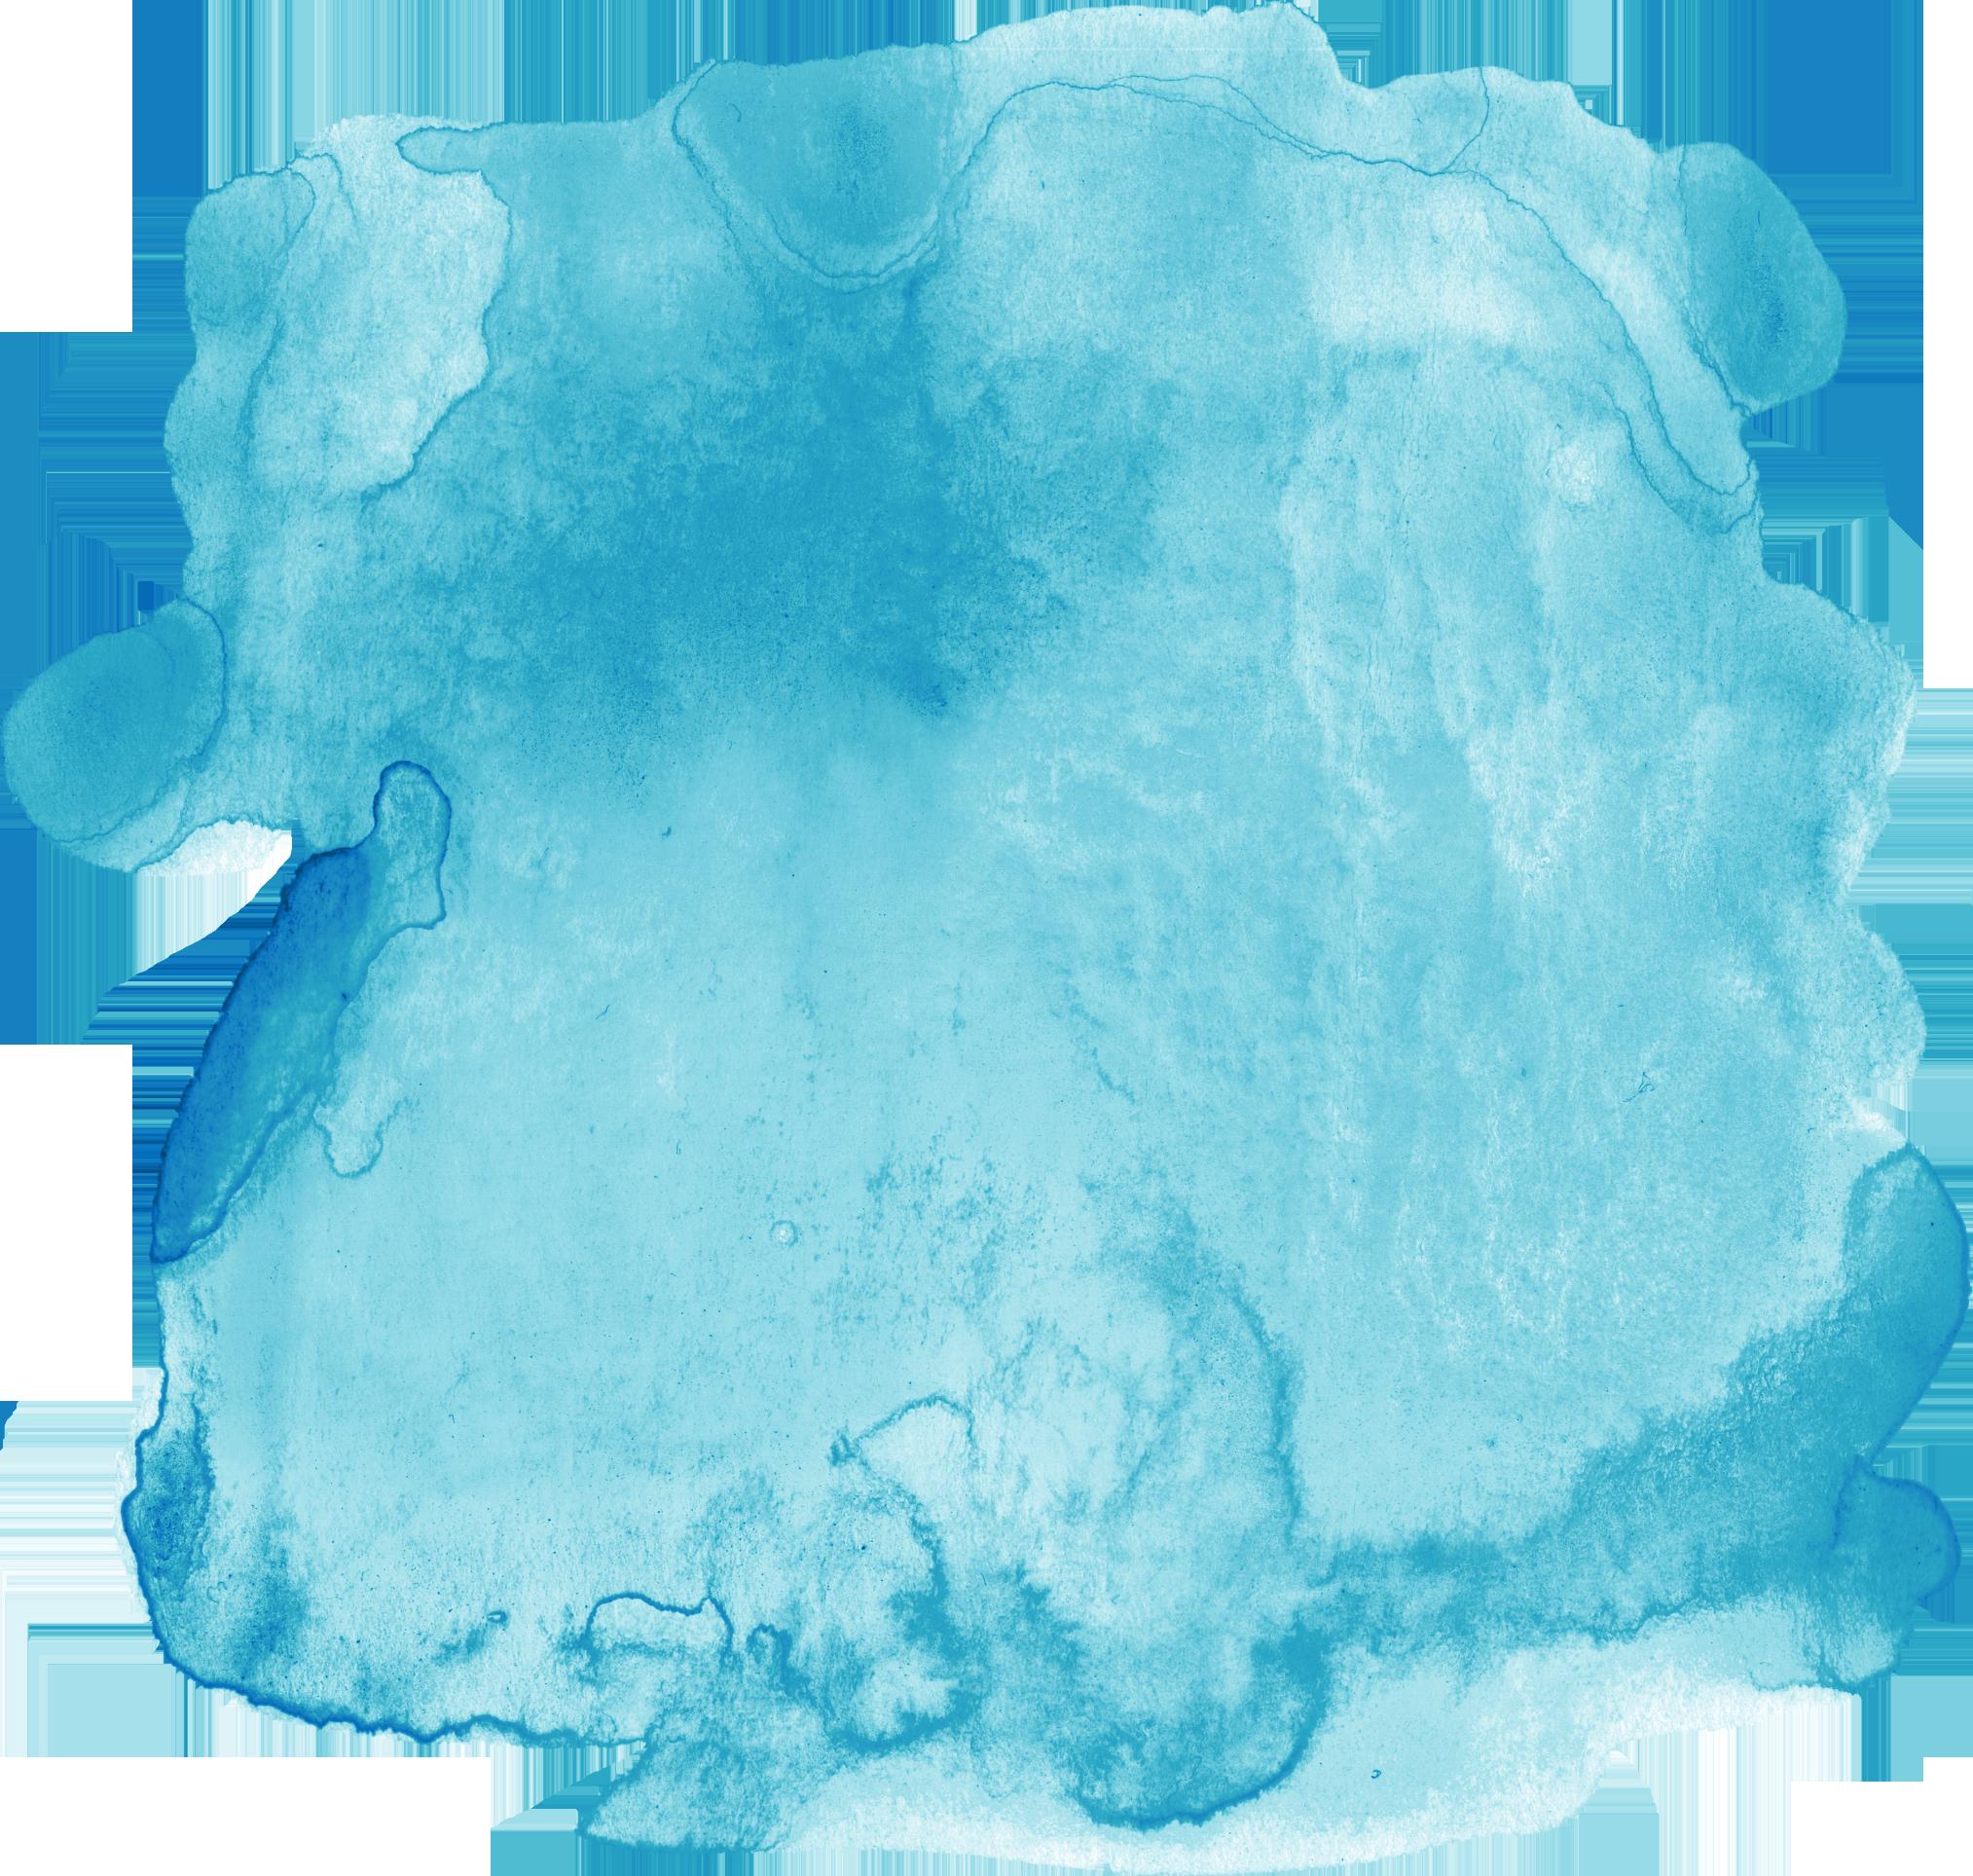 BUCKET LIST - ICELANDIRELANDANTELOPE CANYONOREGON COASTBANFF, CANADAITALYMEXICONEW YORKSWITZERLANDHAWAIIJOSHUA TREEBIG SUR